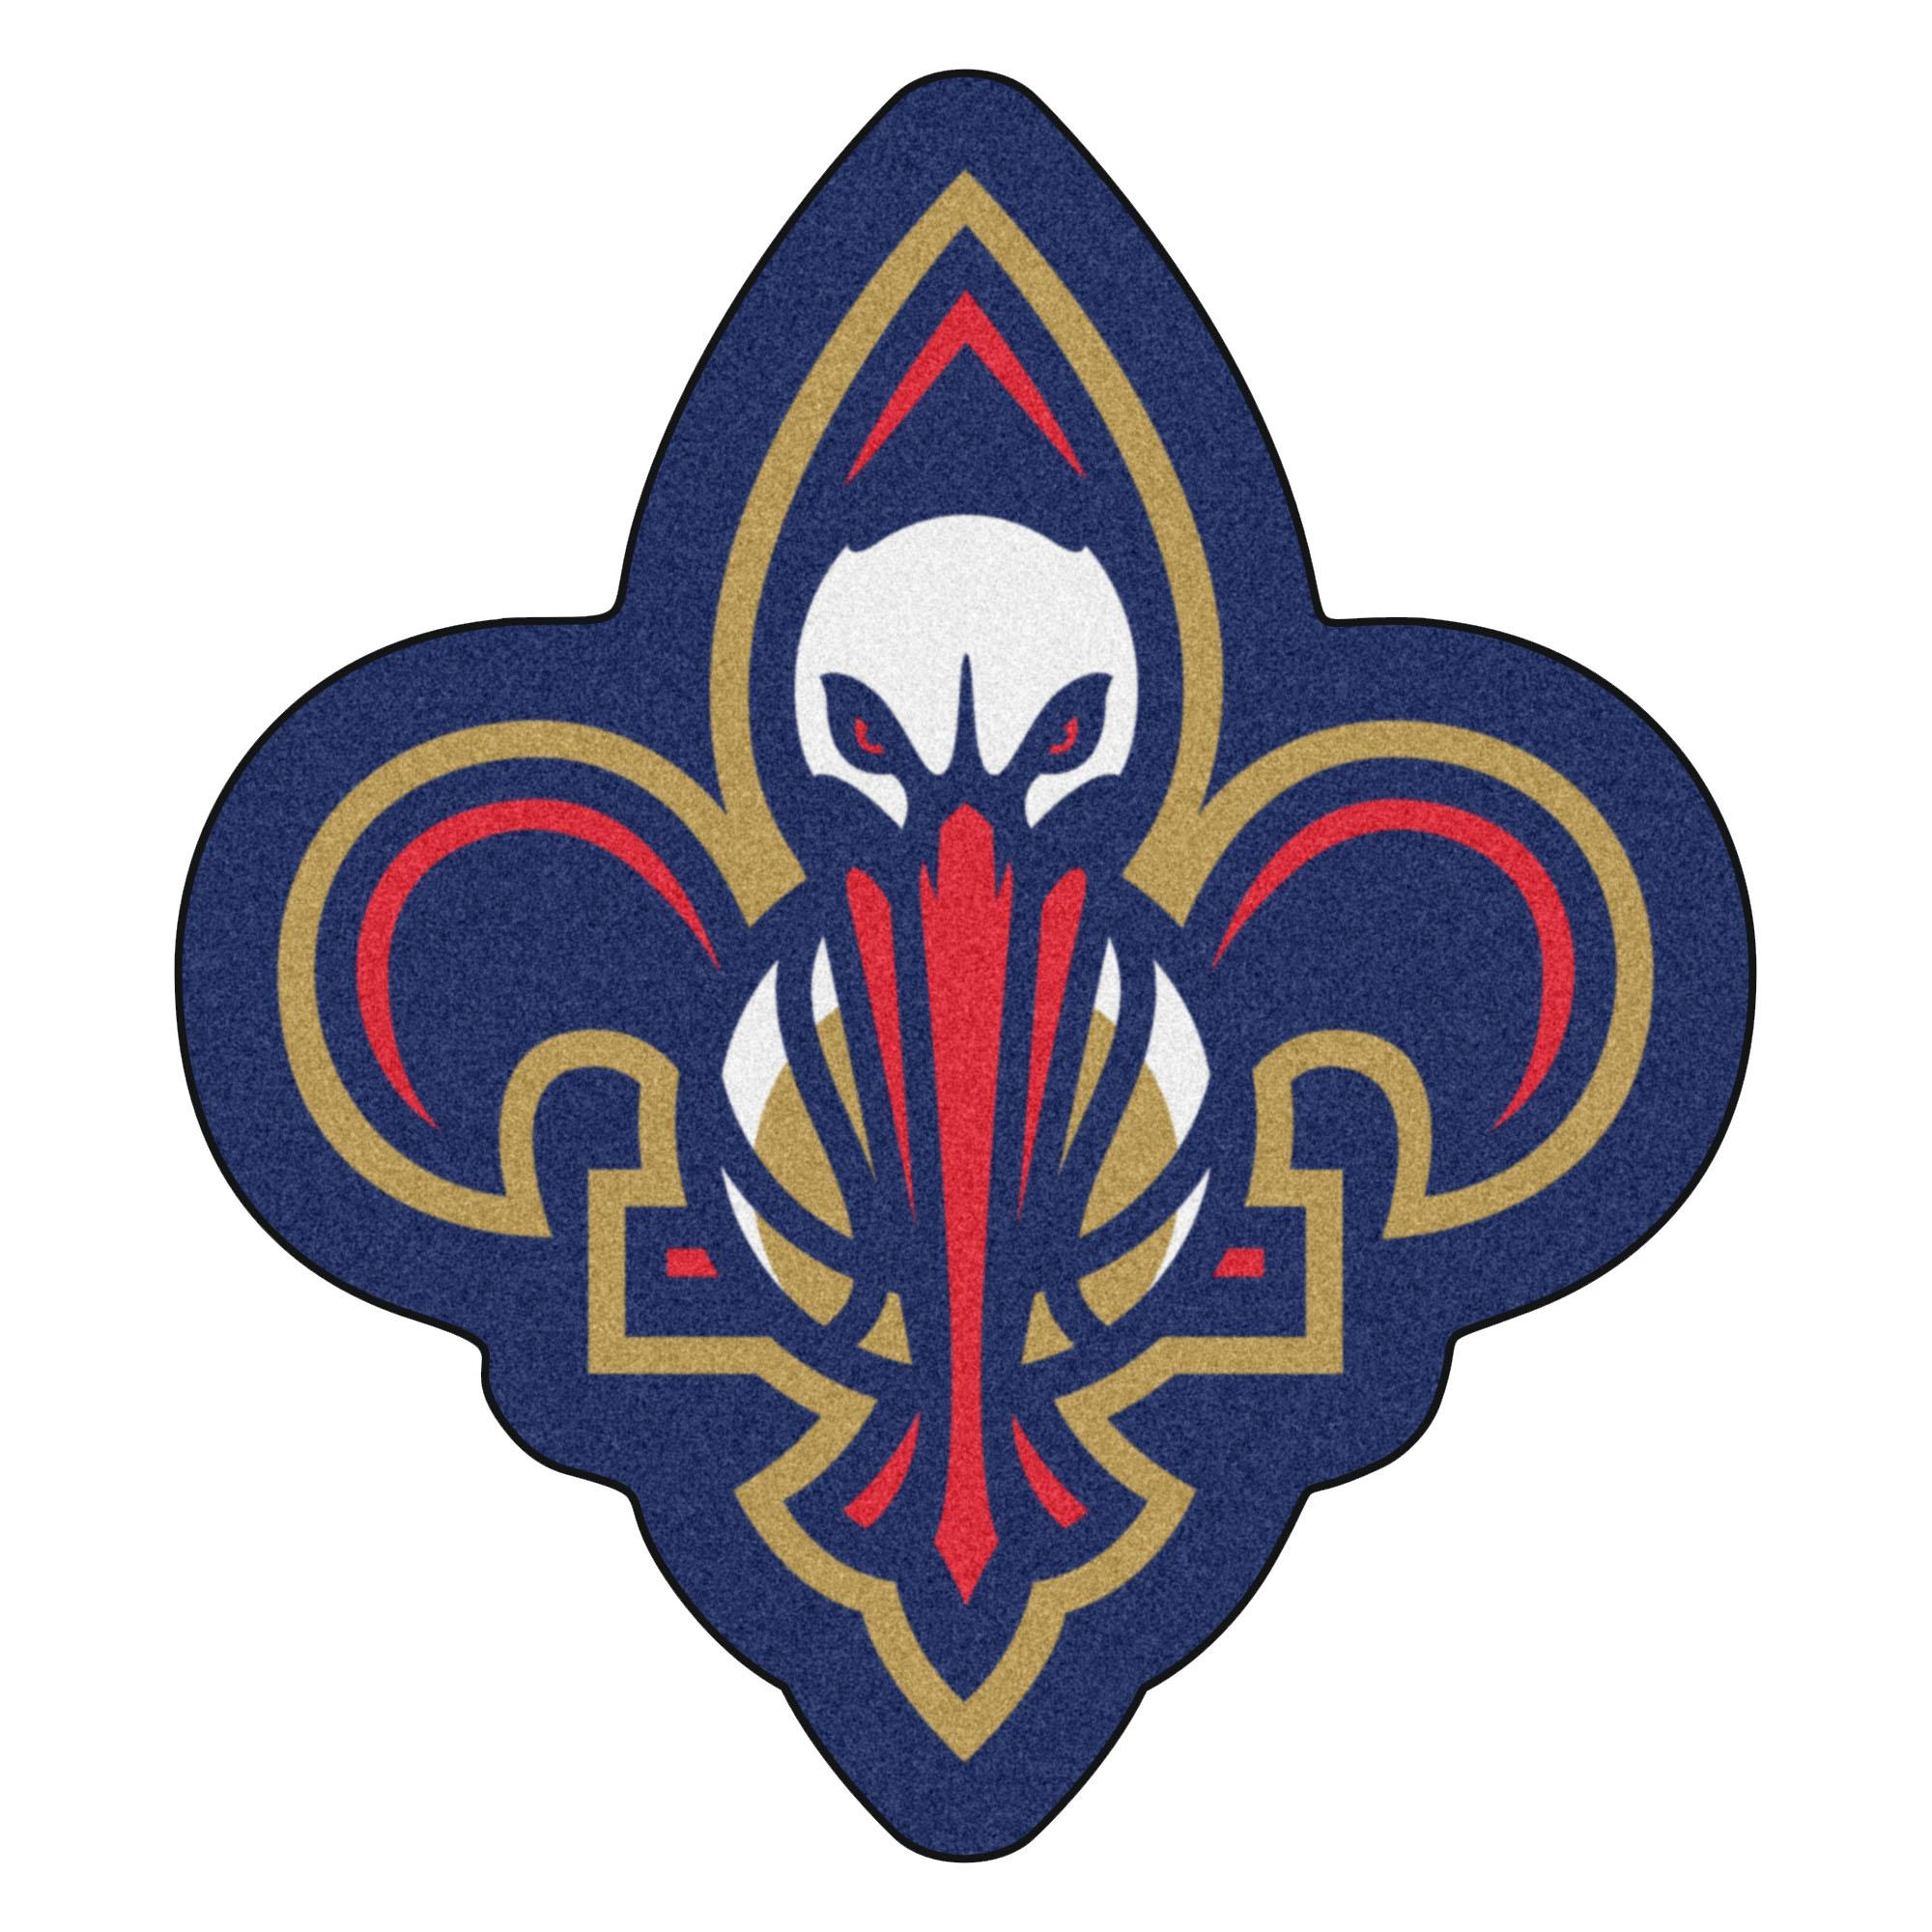 NBA New Orleans Pelicans Mascot Novelty Logo Shaped Area Rug